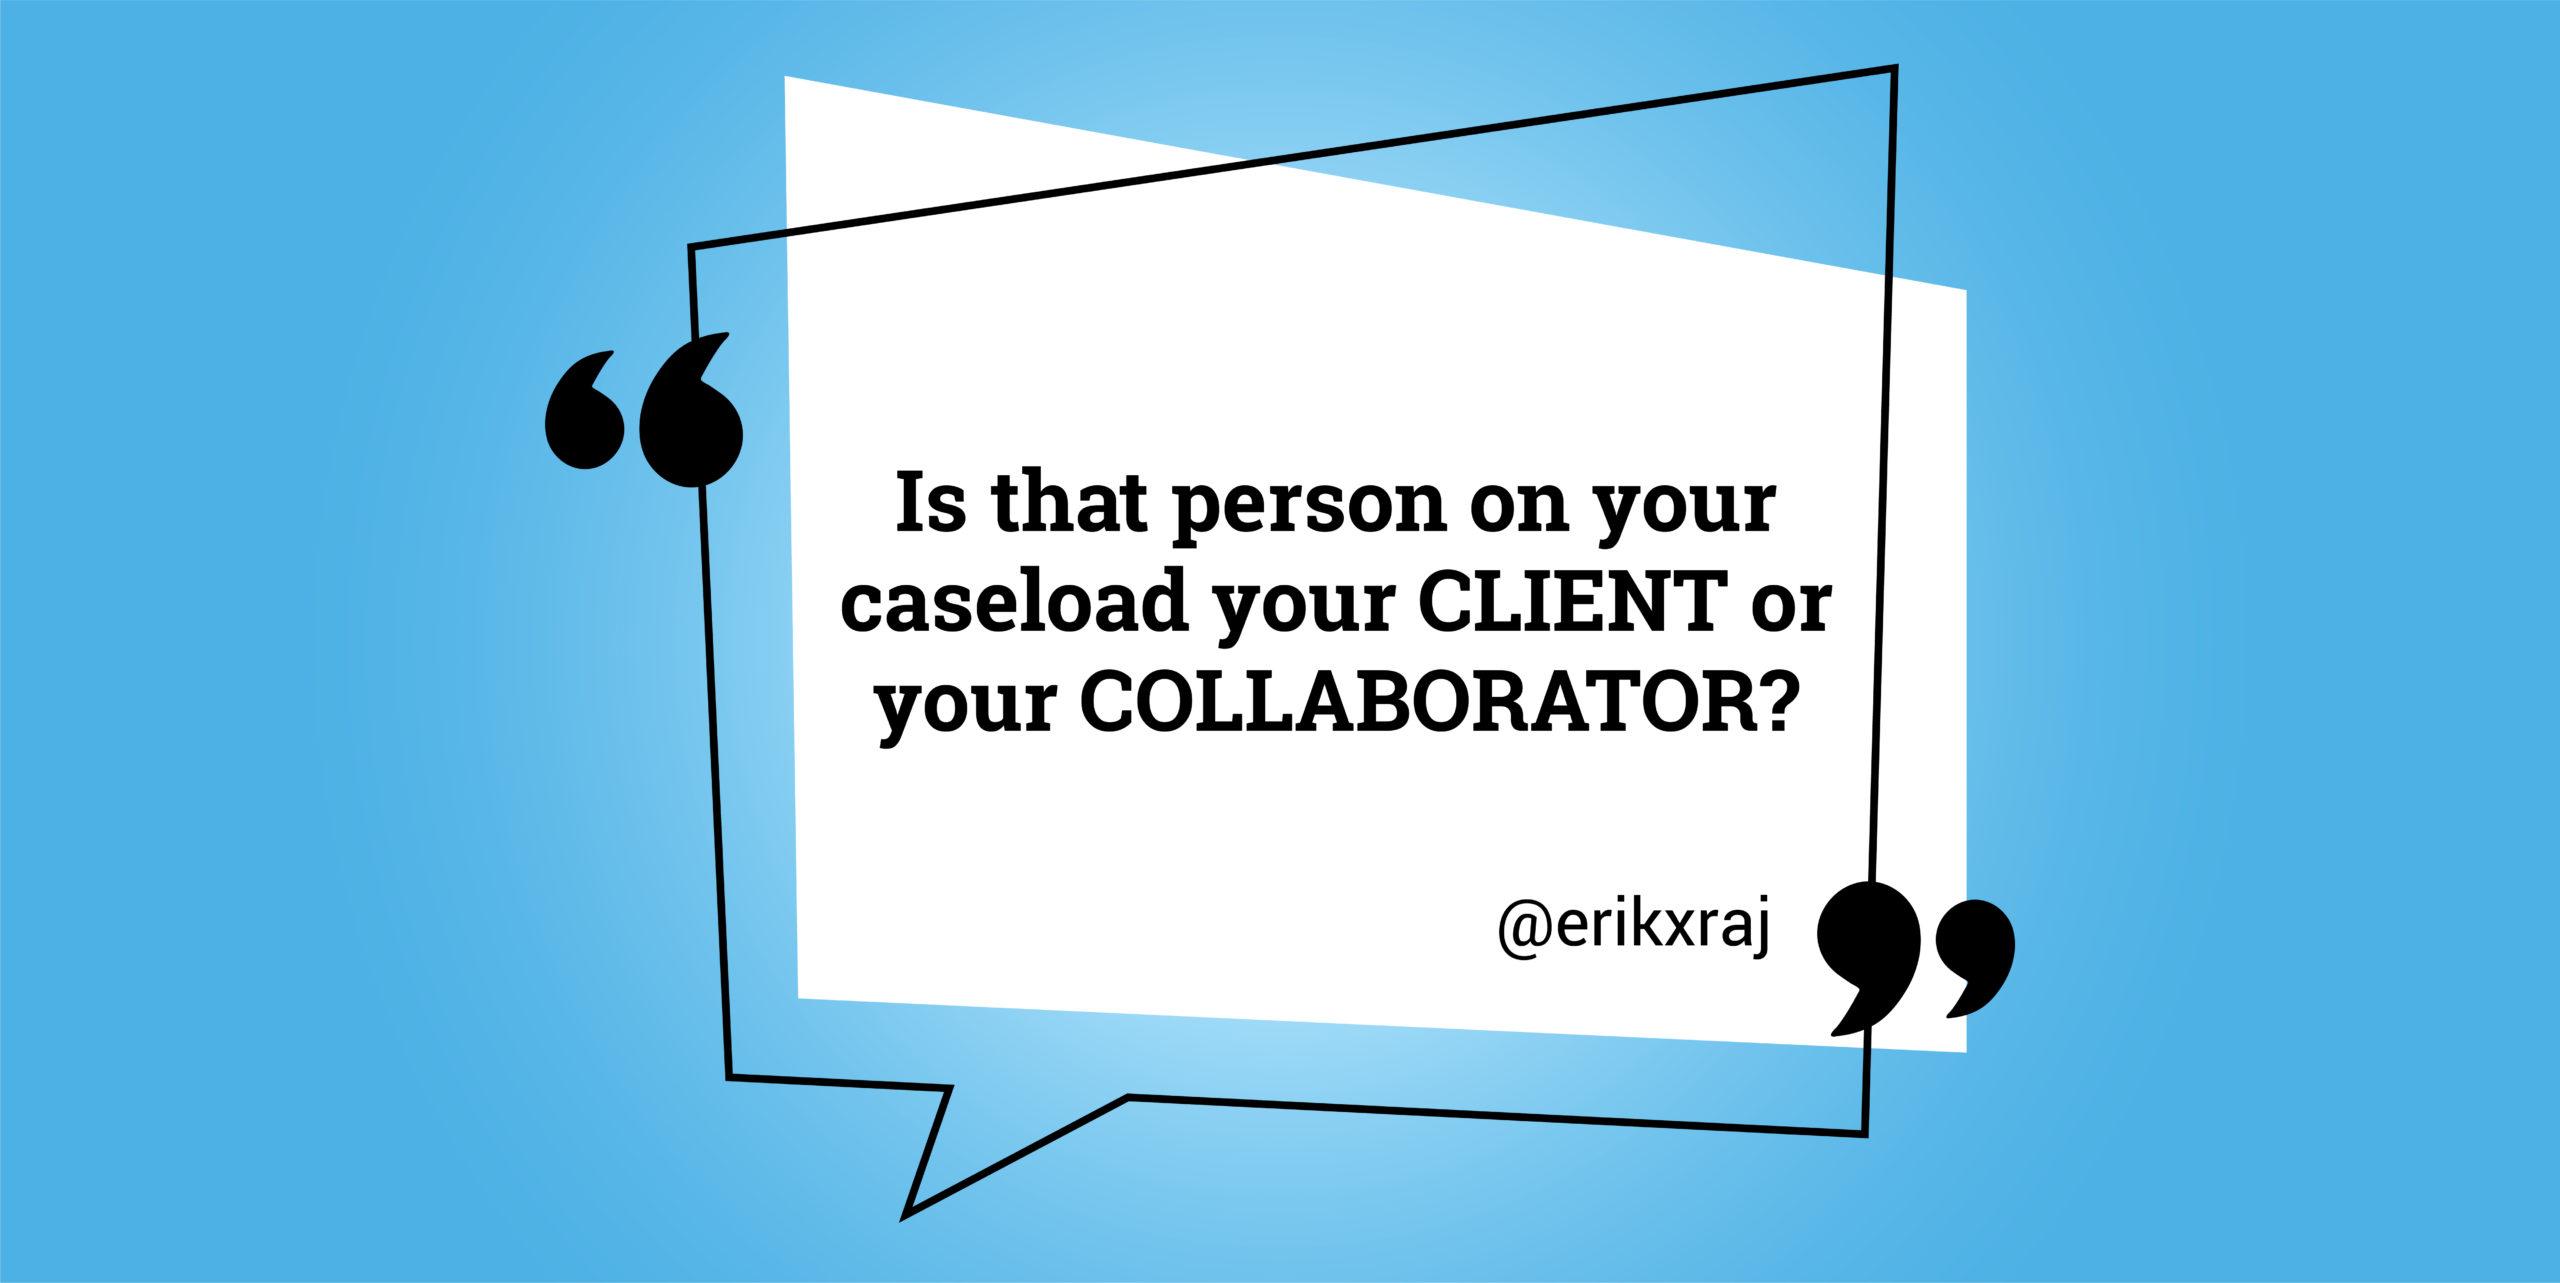 Clients or Collaborators